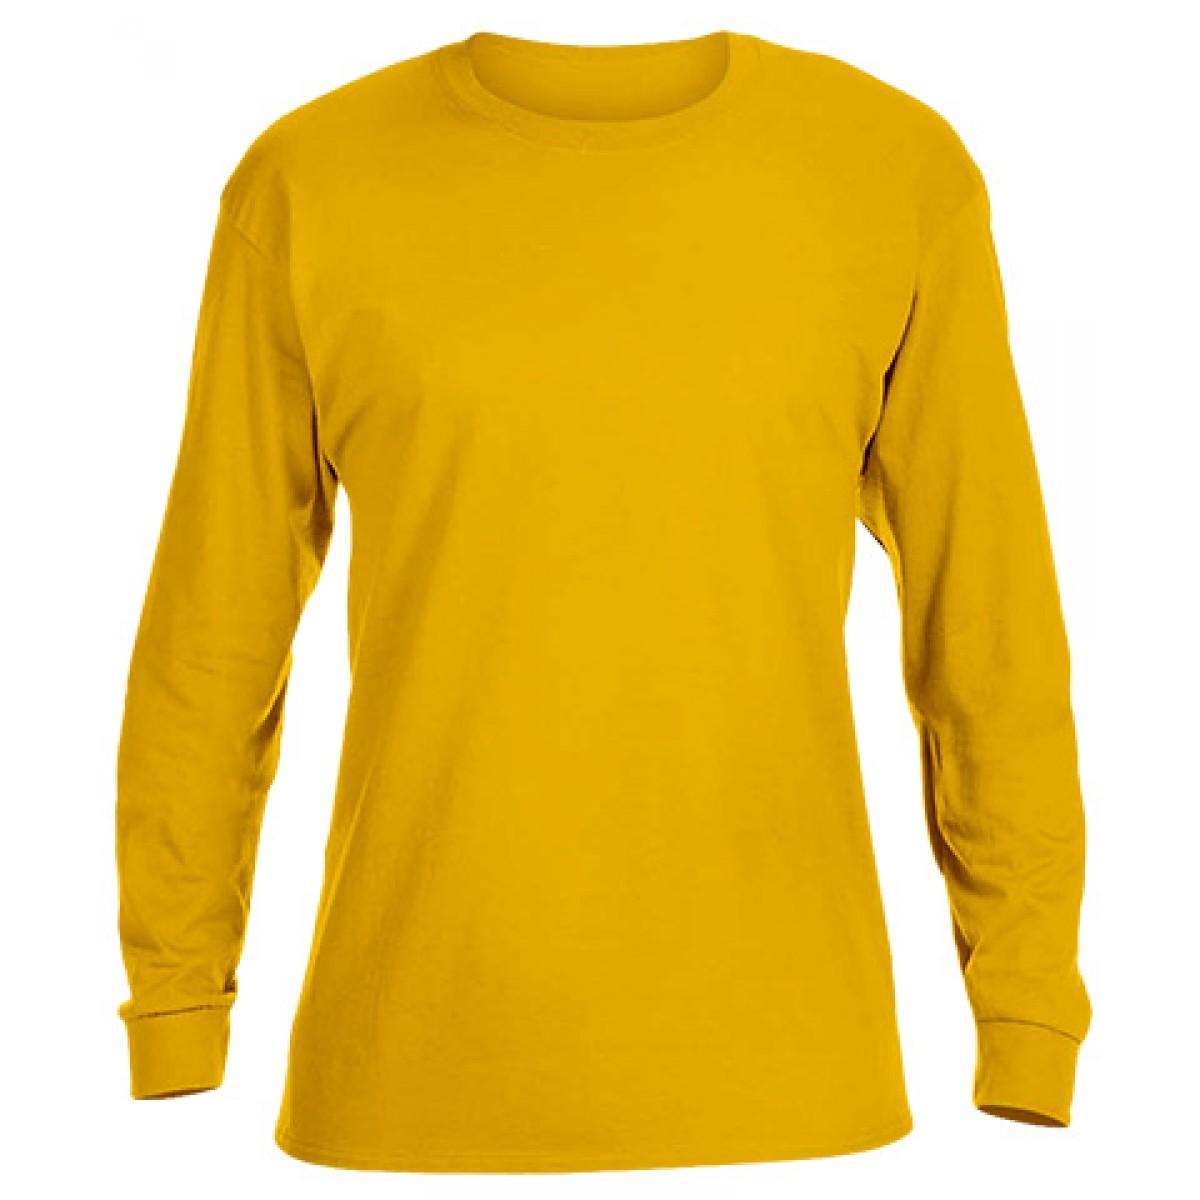 Heavy Cotton Long-Sleeve Adidas Shirt-Gold-2XL